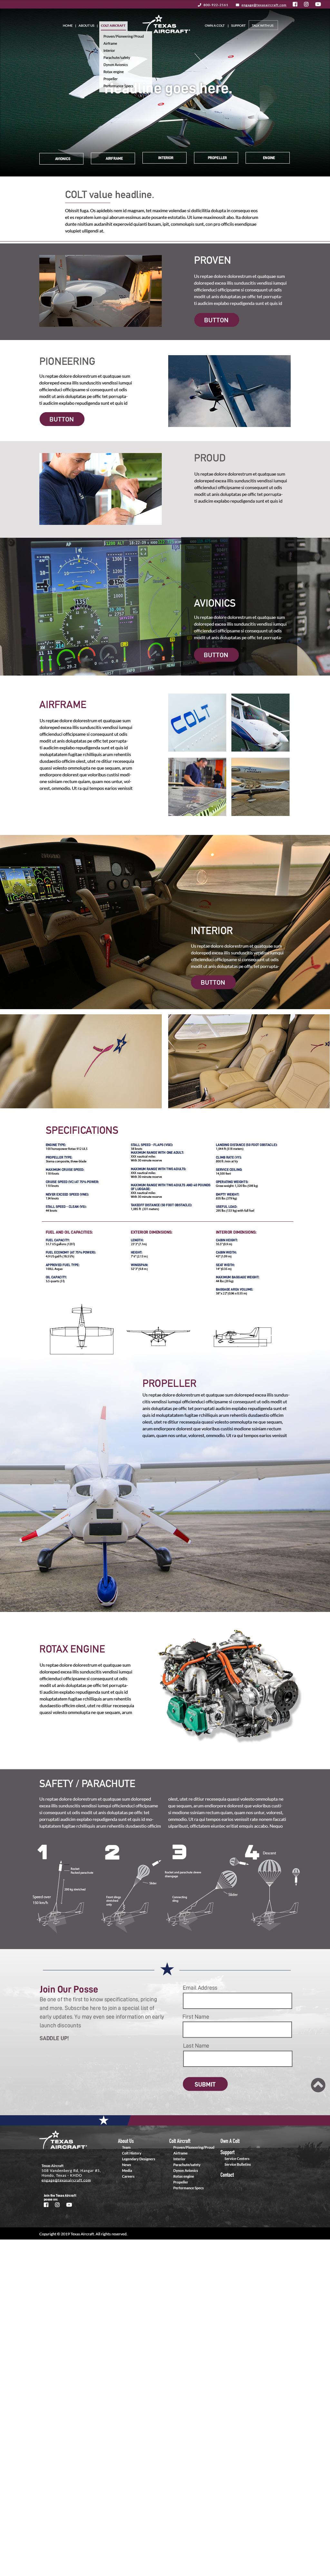 TA_Website_Design_colt2